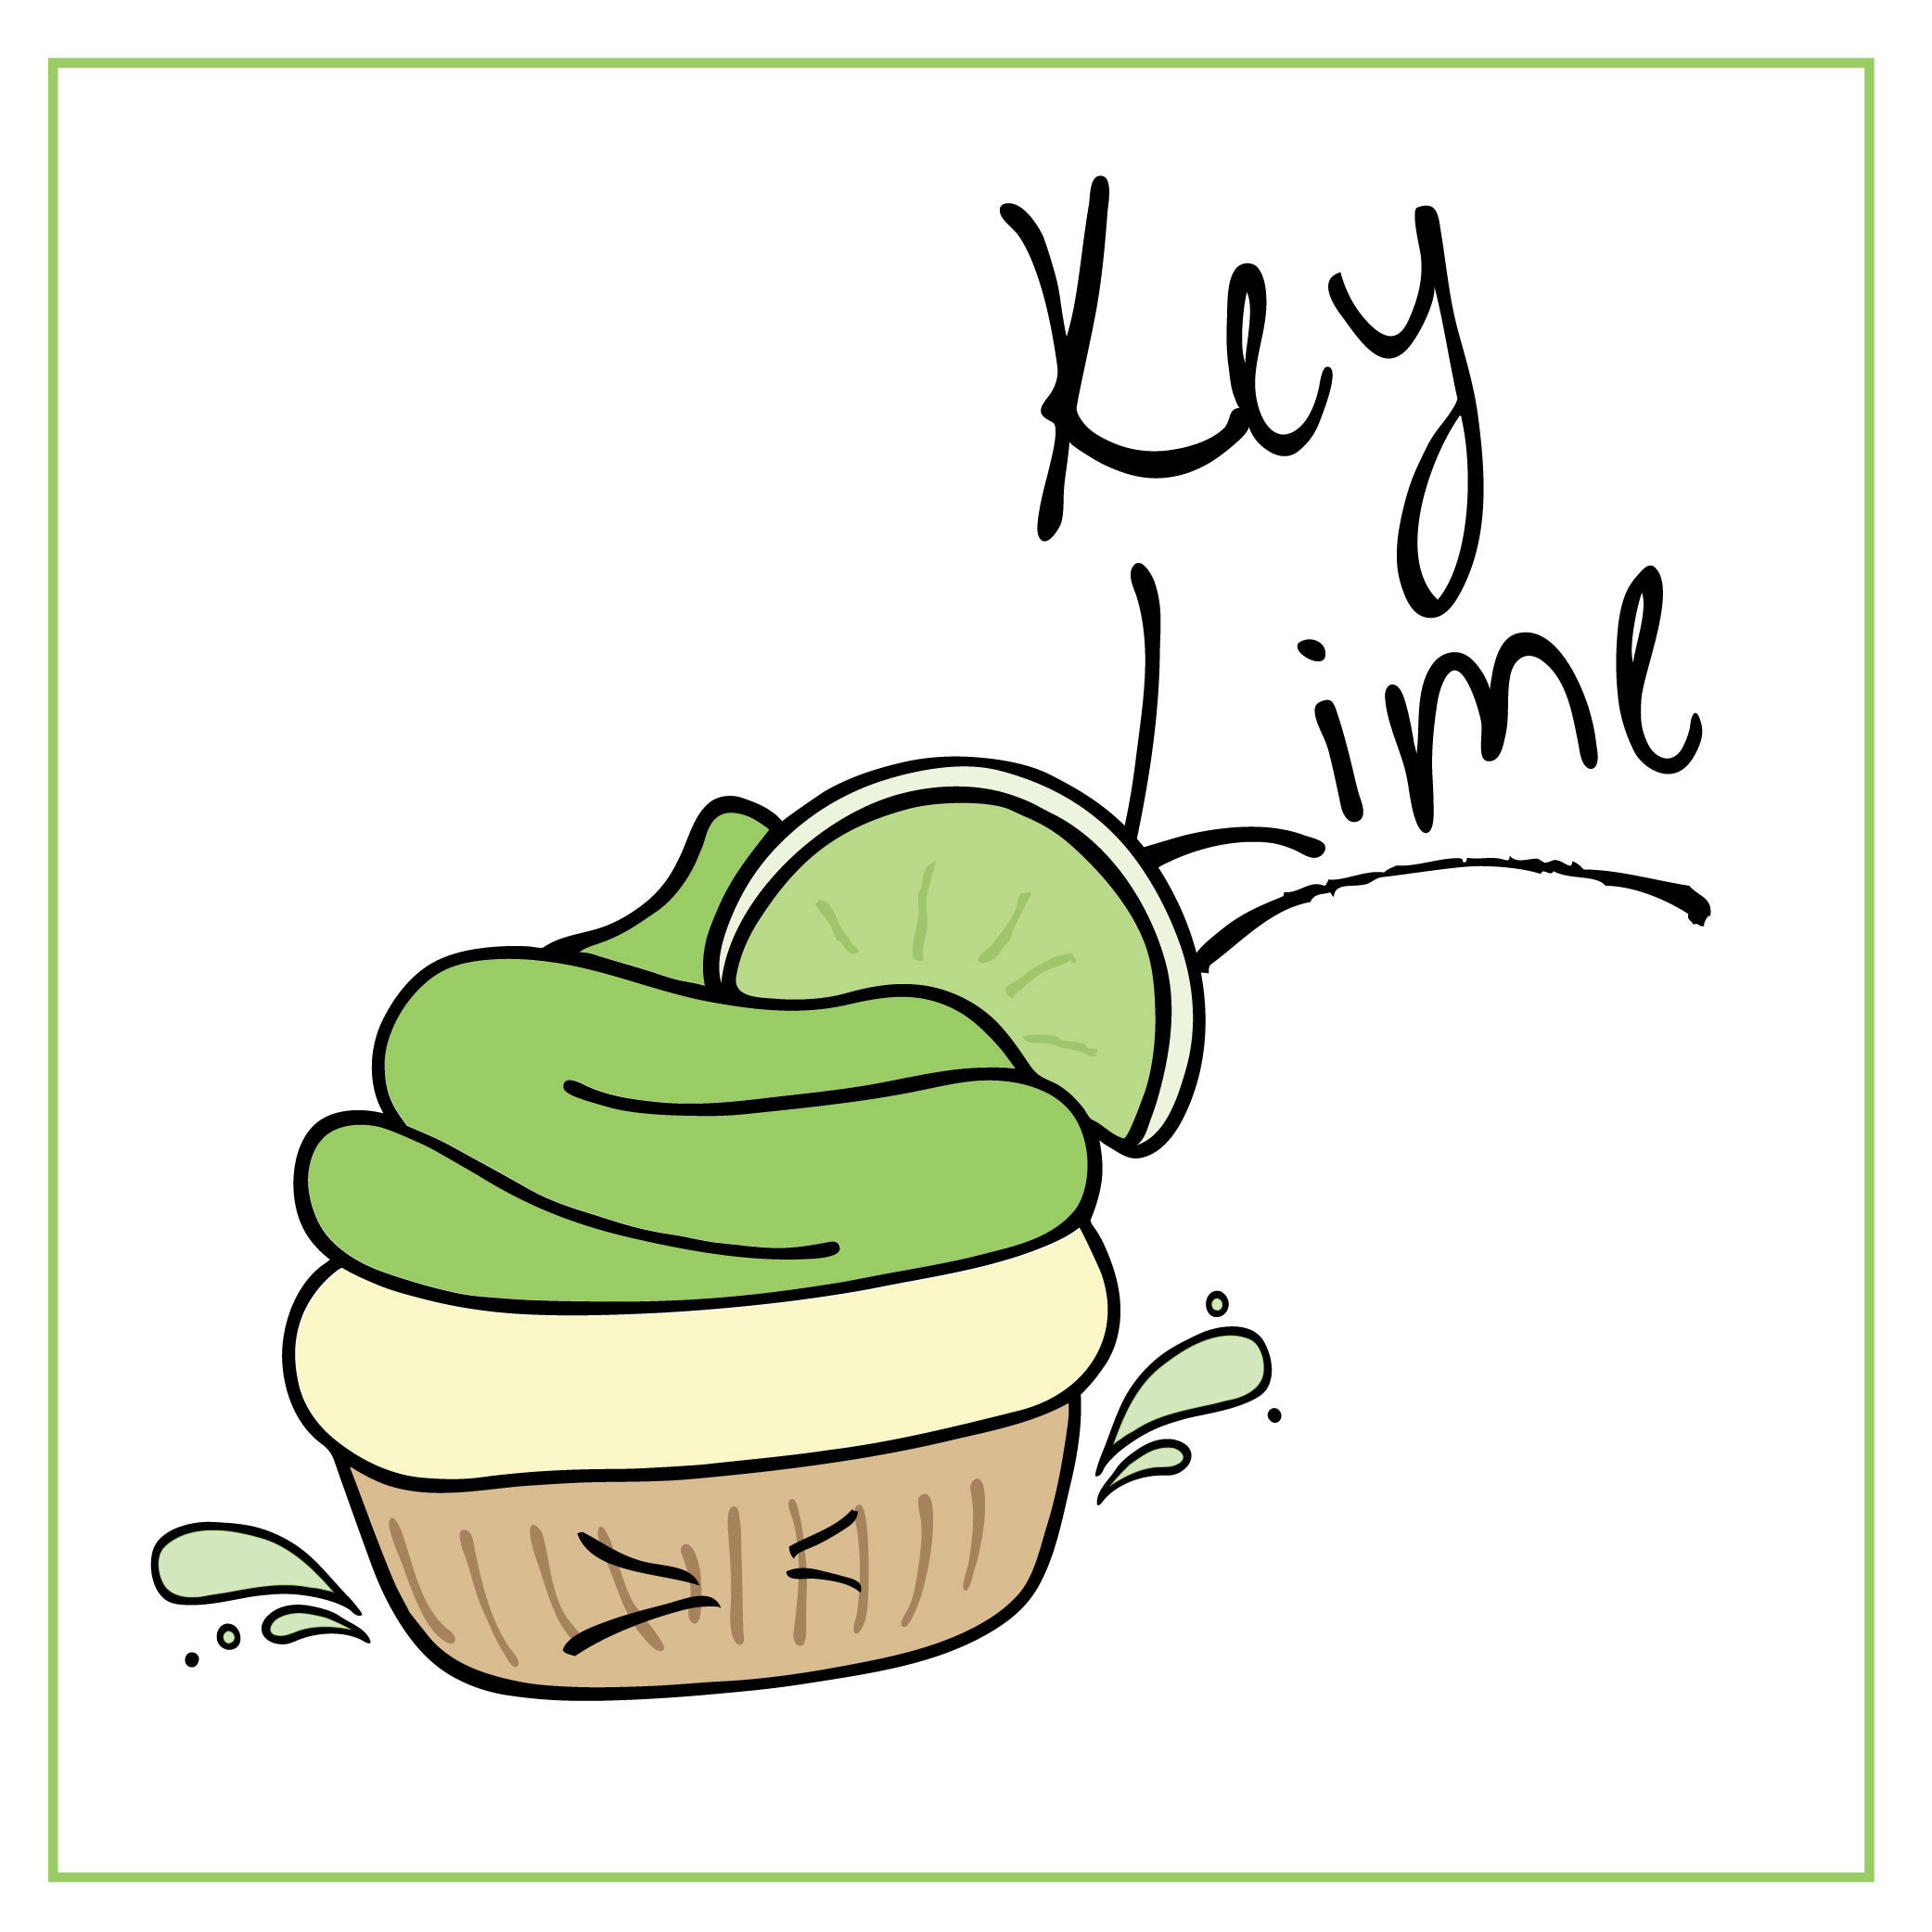 Key-Lime-Squared-01.jpg